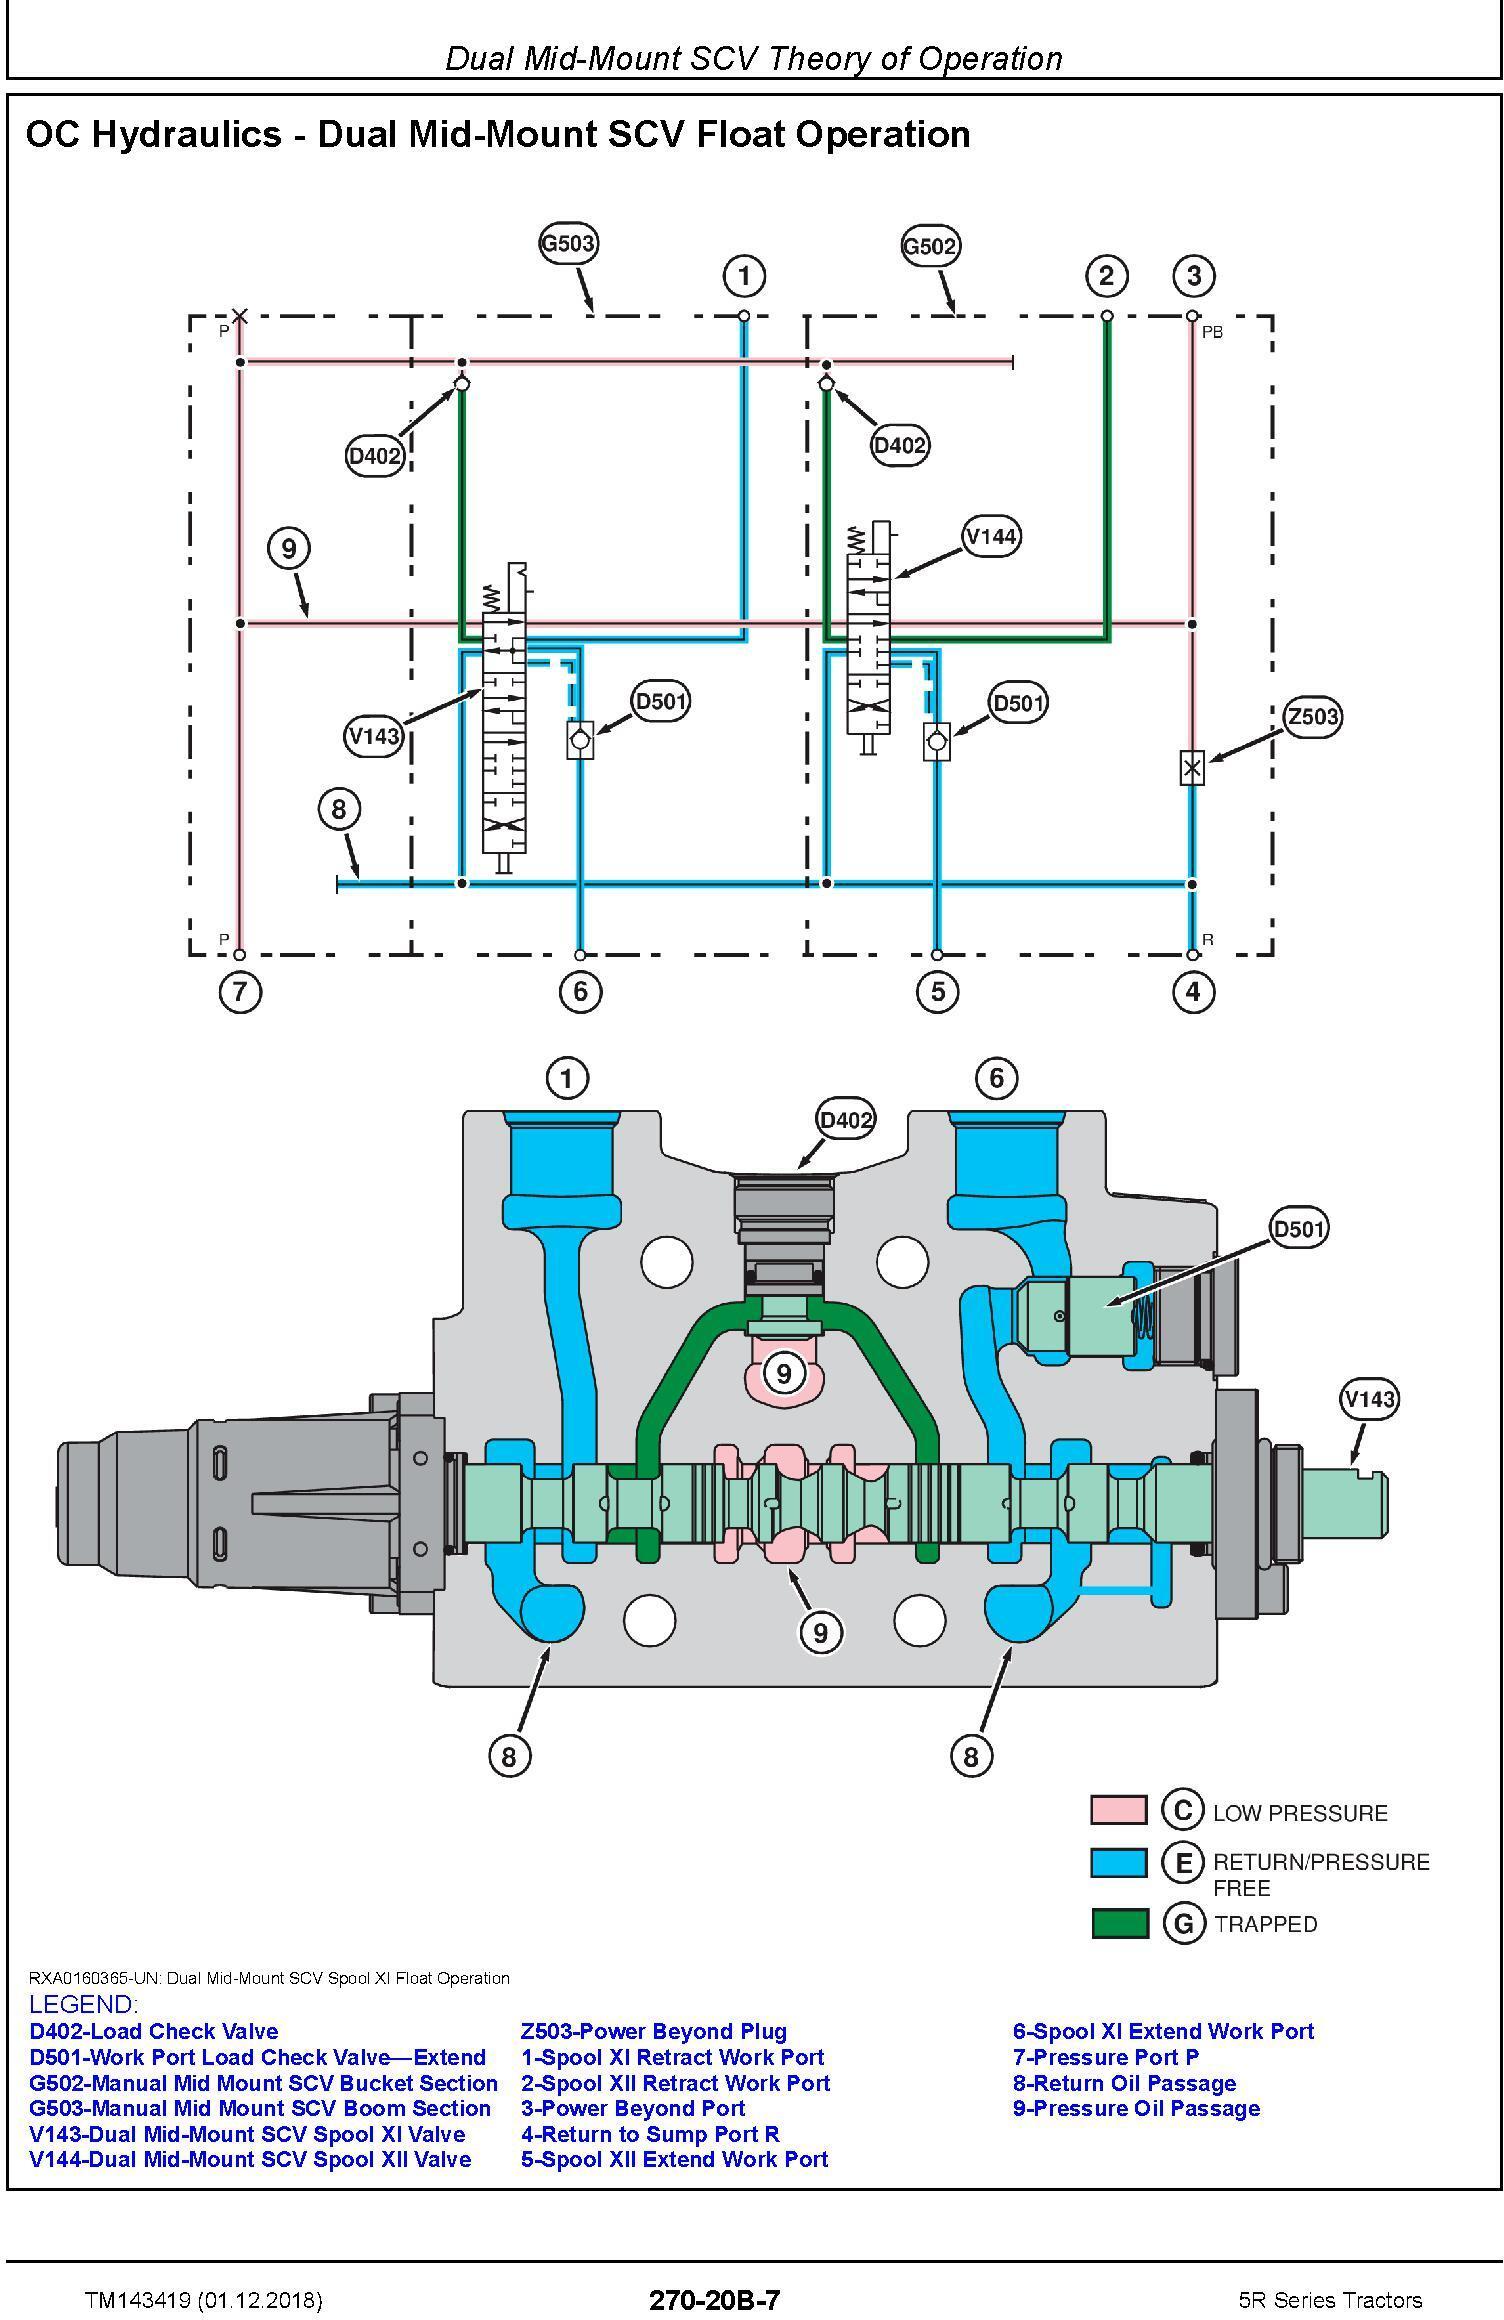 John Deere 5090R, 5100R, 5115R, 5115RH,5125R Tractors Diagnostic Technical Service Manual (TM143419) - 3